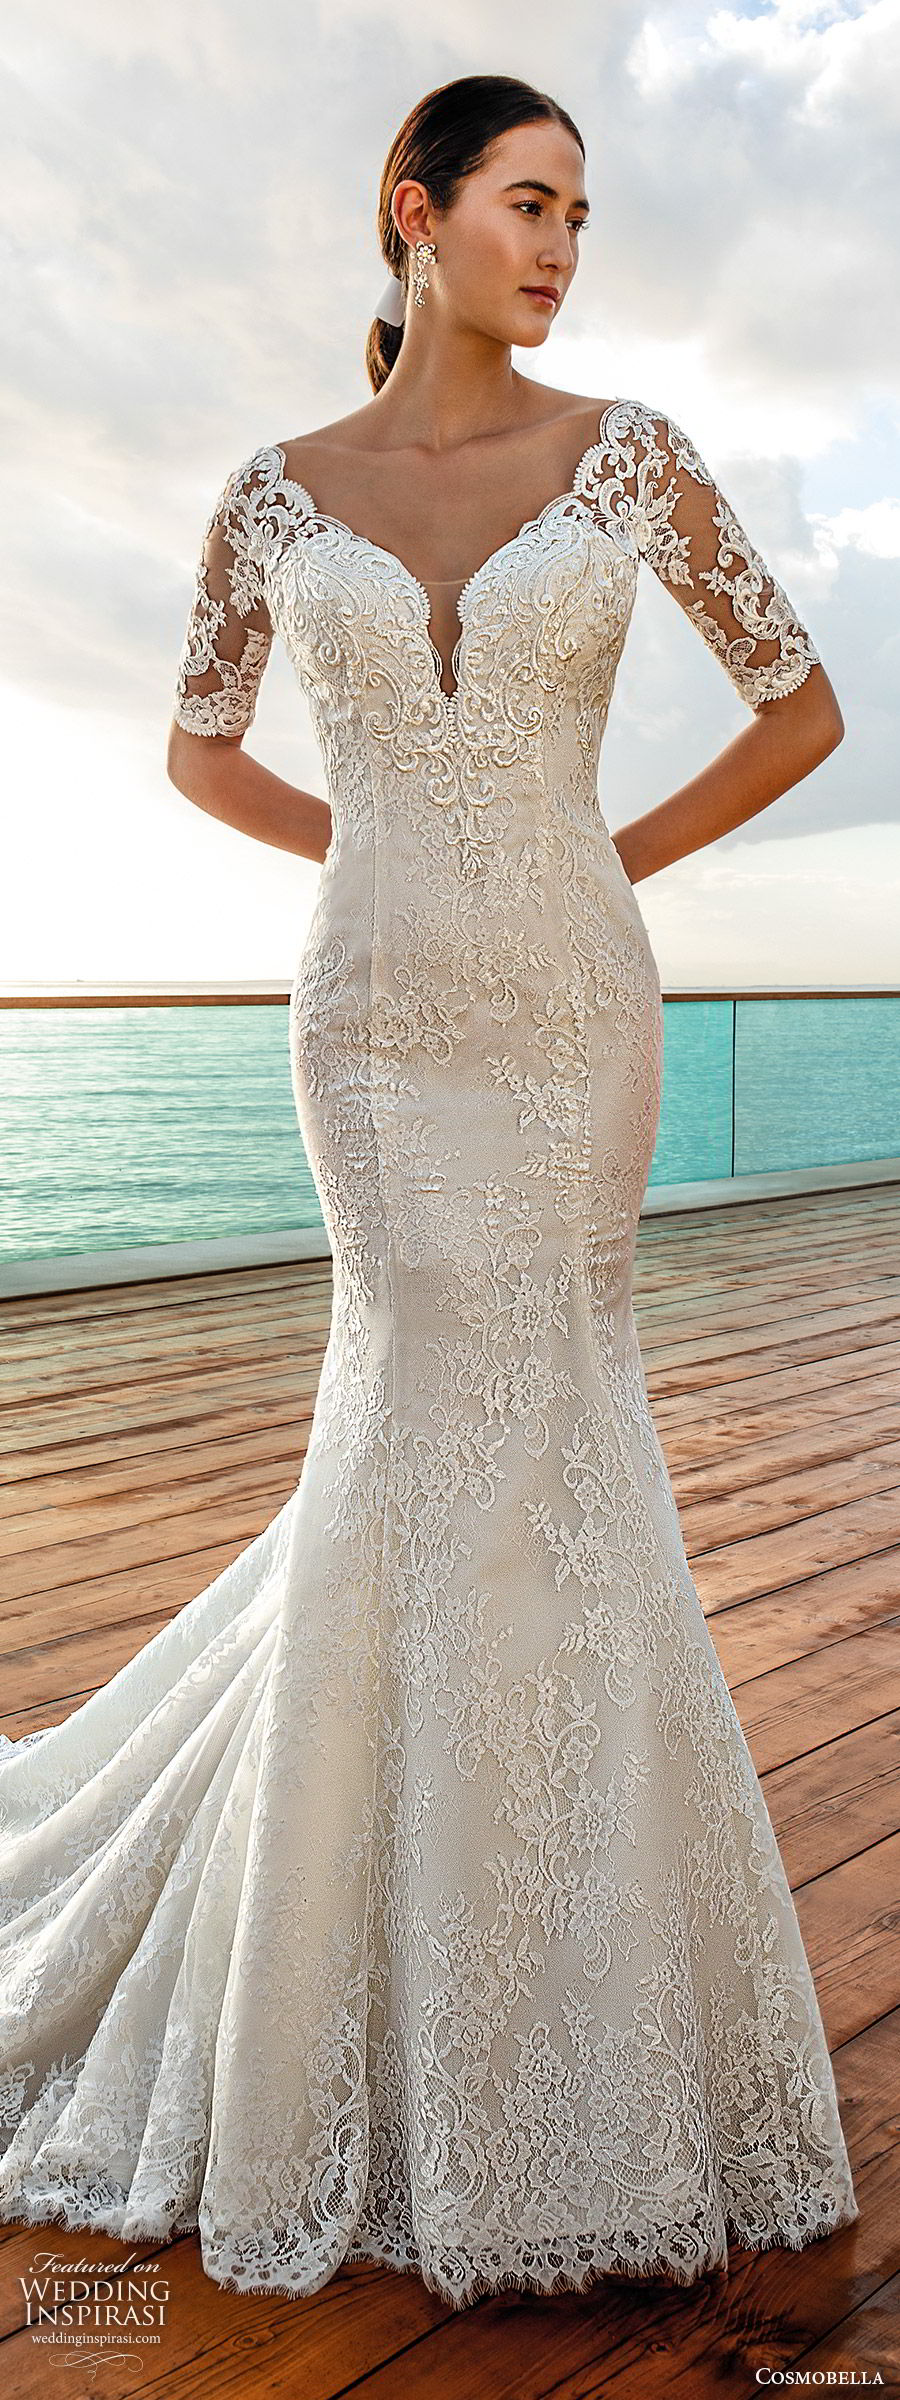 Cosmobella 2020 Wedding Dresses Eterea Eleganza Bridal Collection Wedding Inspirasi,Summer Elegant Pakistani Wedding Guest Dresses